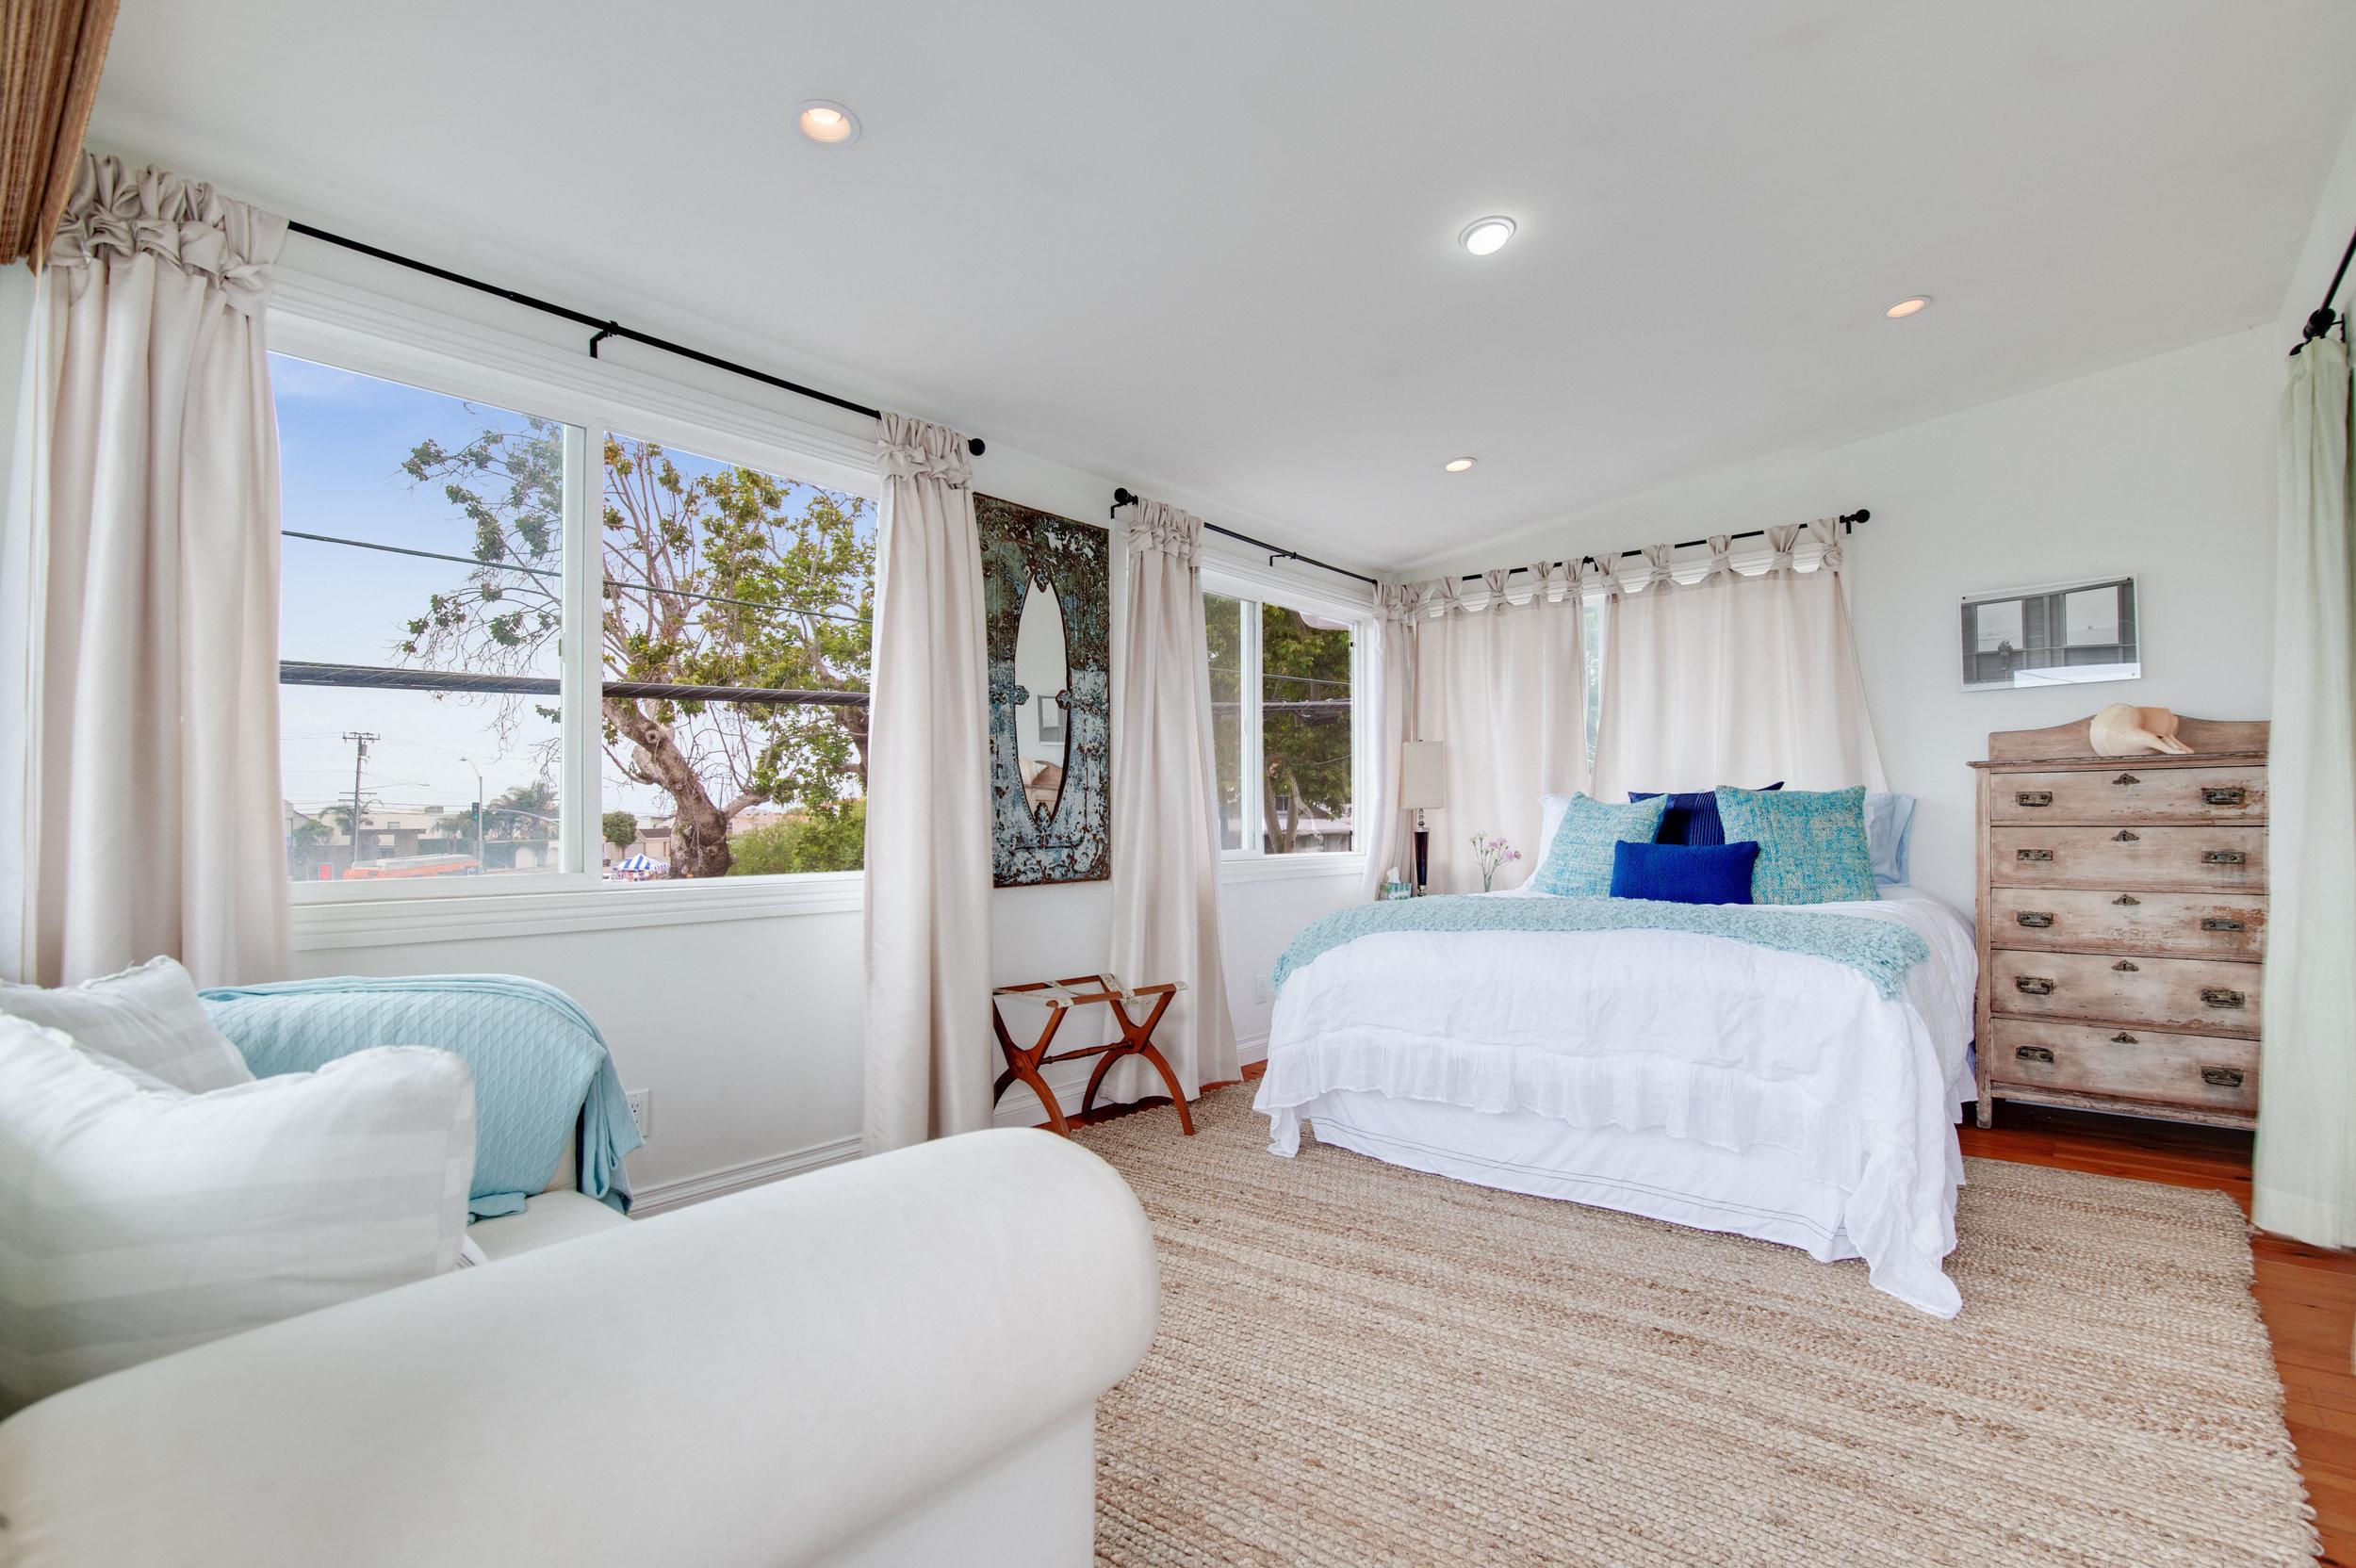 009 Bedroom 3952 Las Flores For Sale Lease The Malibu Life Team Luxury Real Estate.jpg